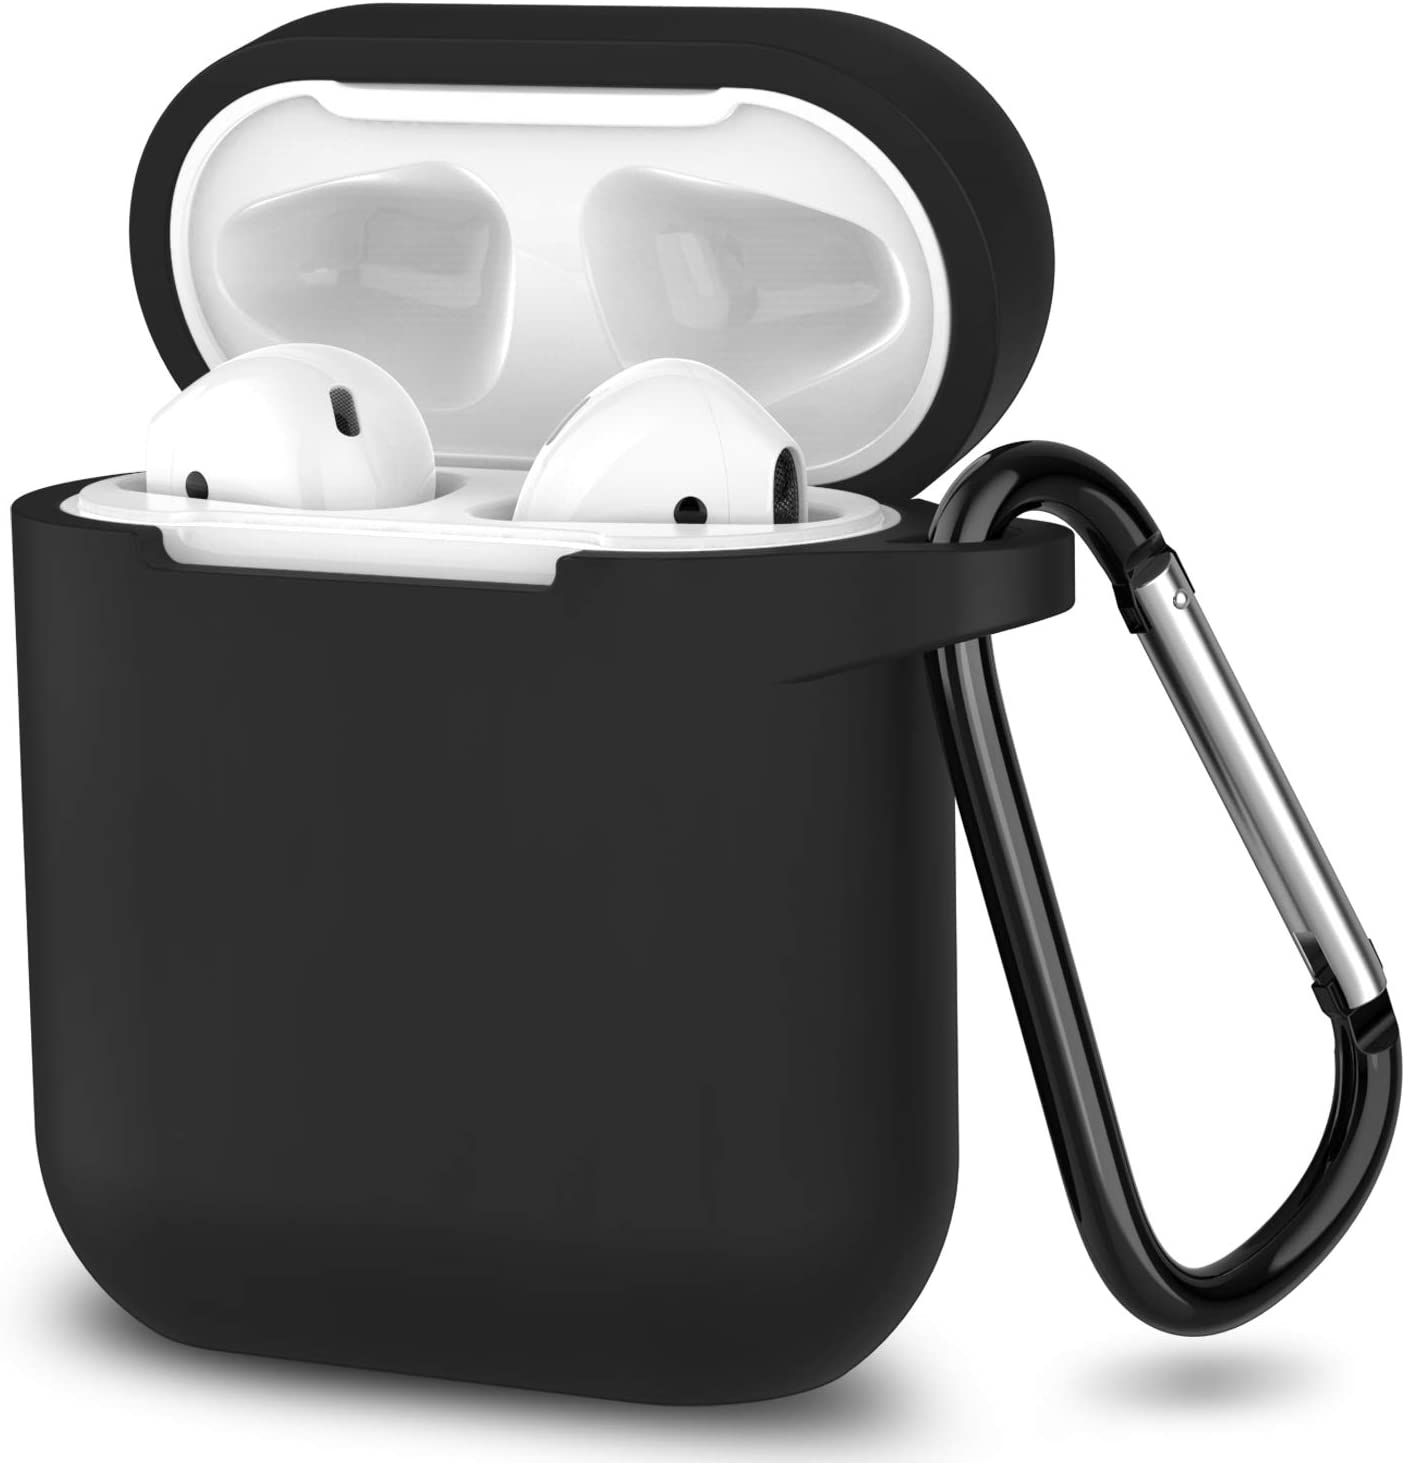 Missouri Tigers Silicone Case Cover for Apple AirPod Battery Case Black